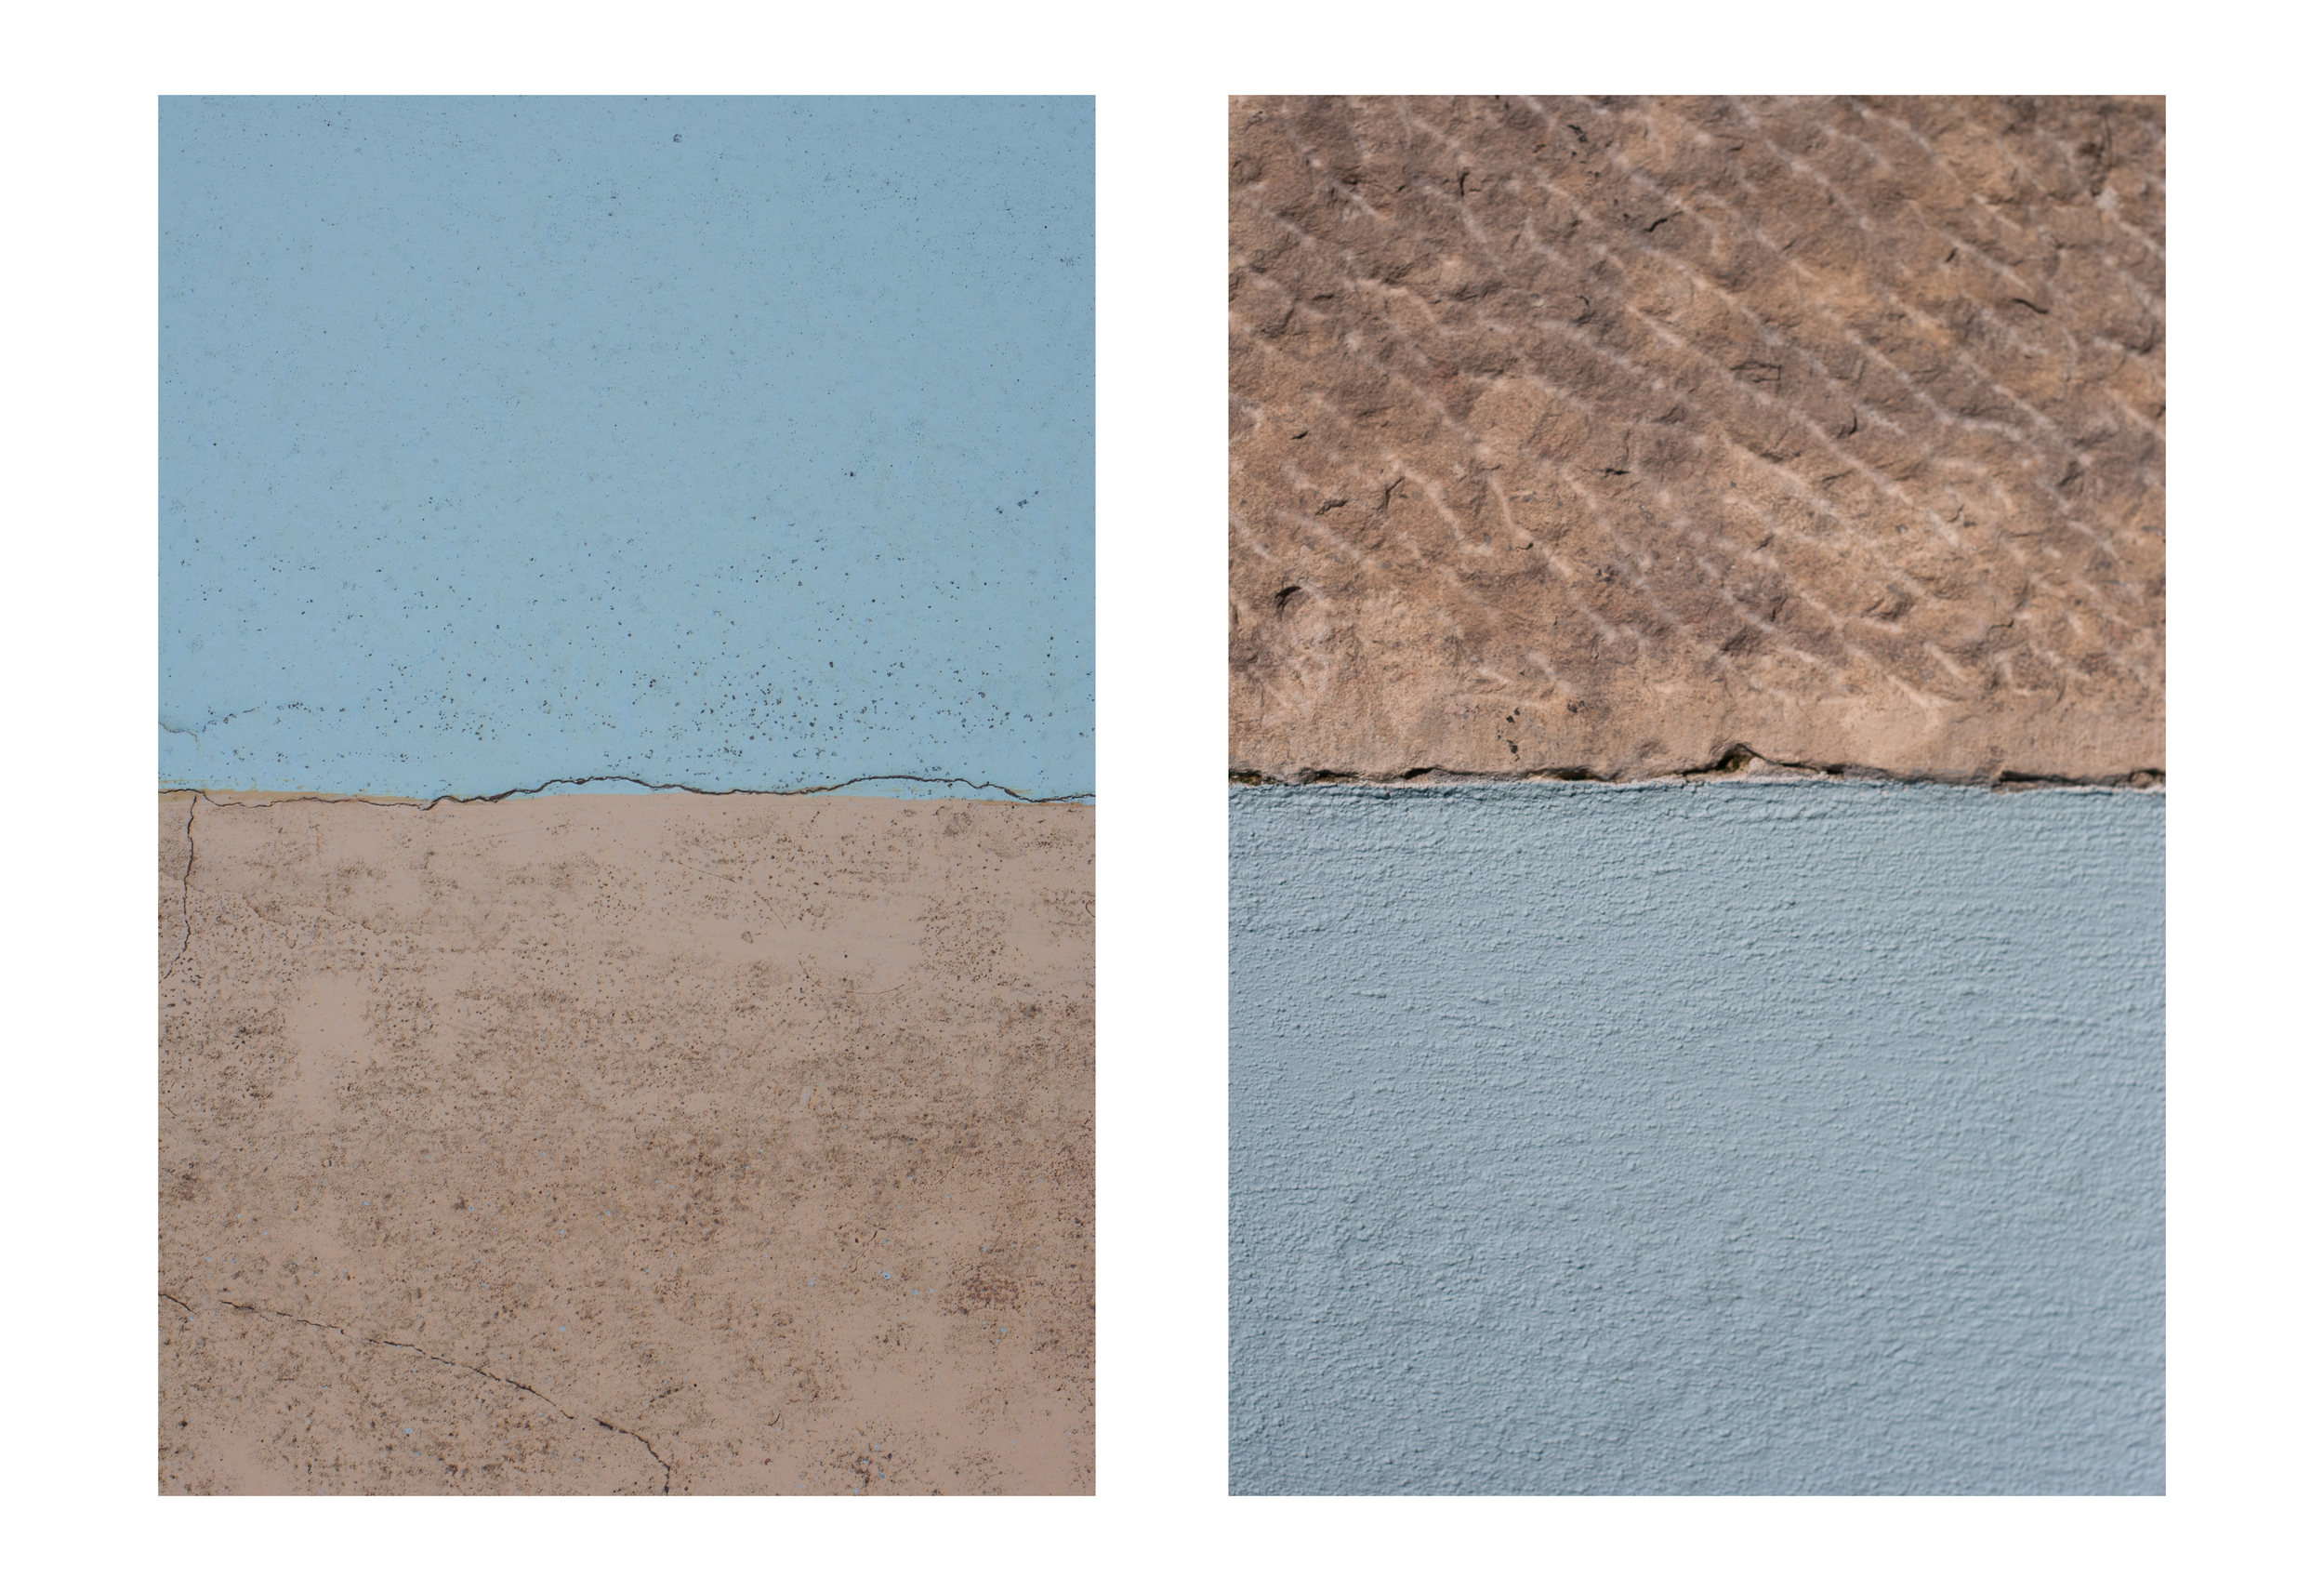 halfandhalf 1 (Pelotas) and halfandhalf 2 (Lisboa) by Gavin White